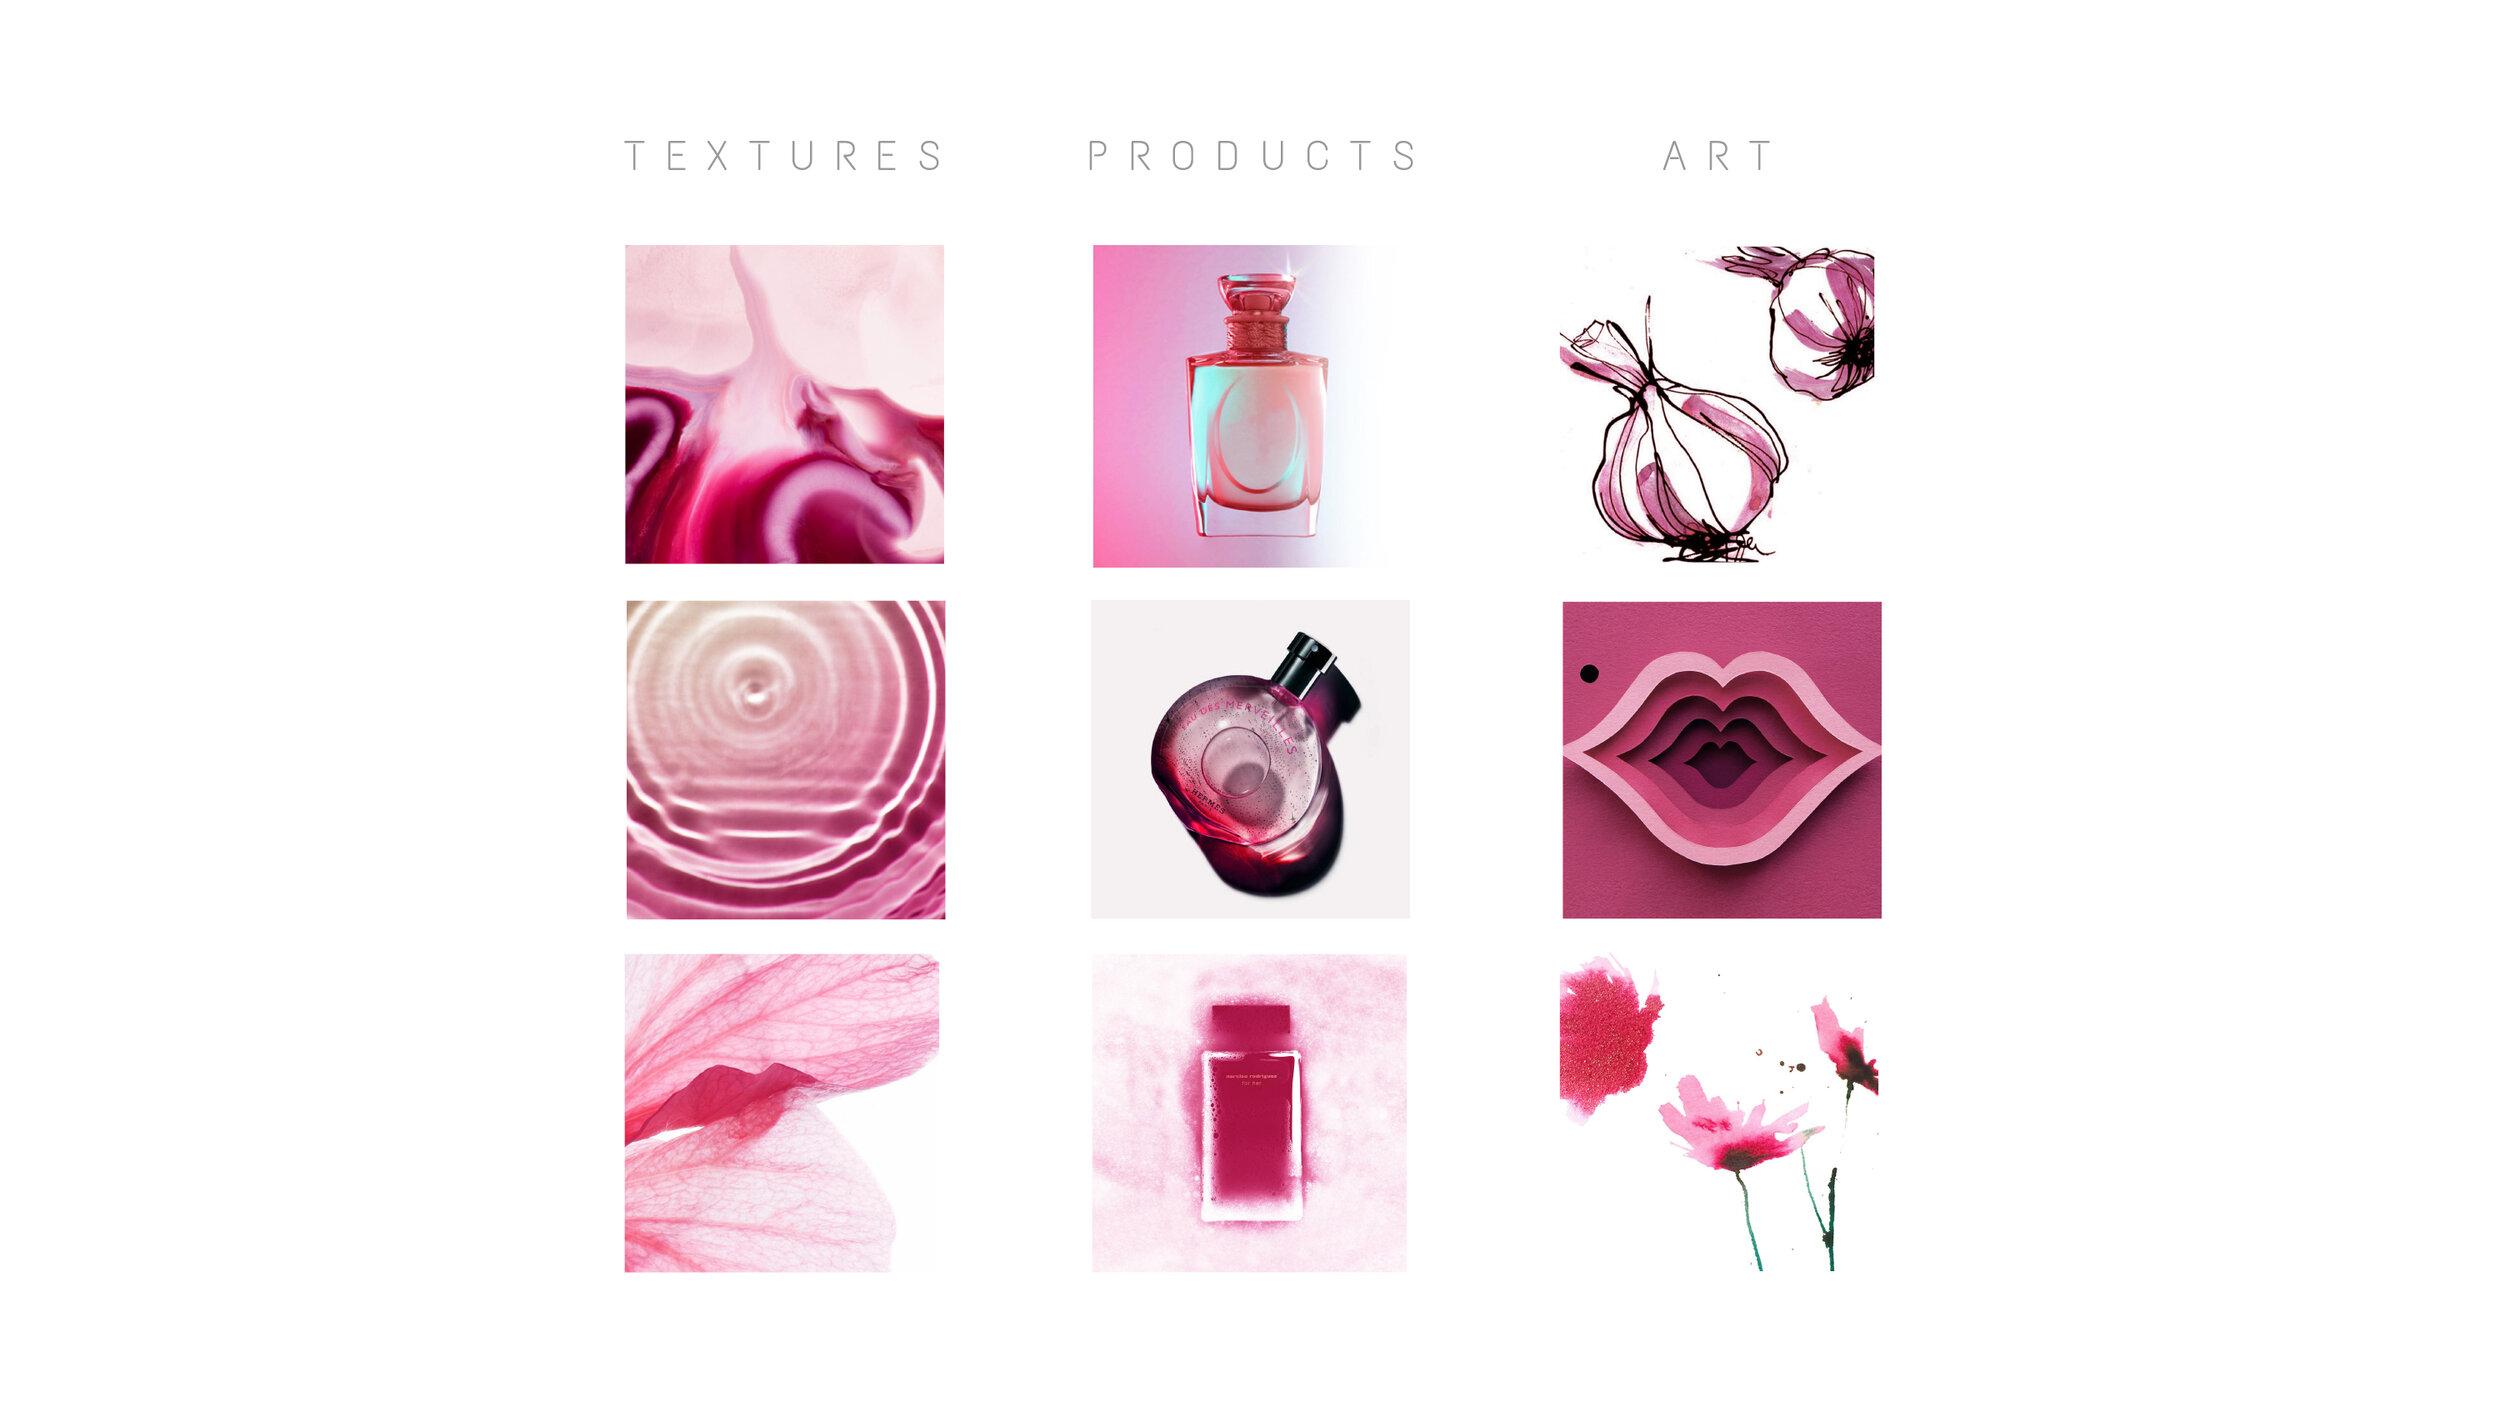 shiseido_brandbook_whitelucent2.jpg